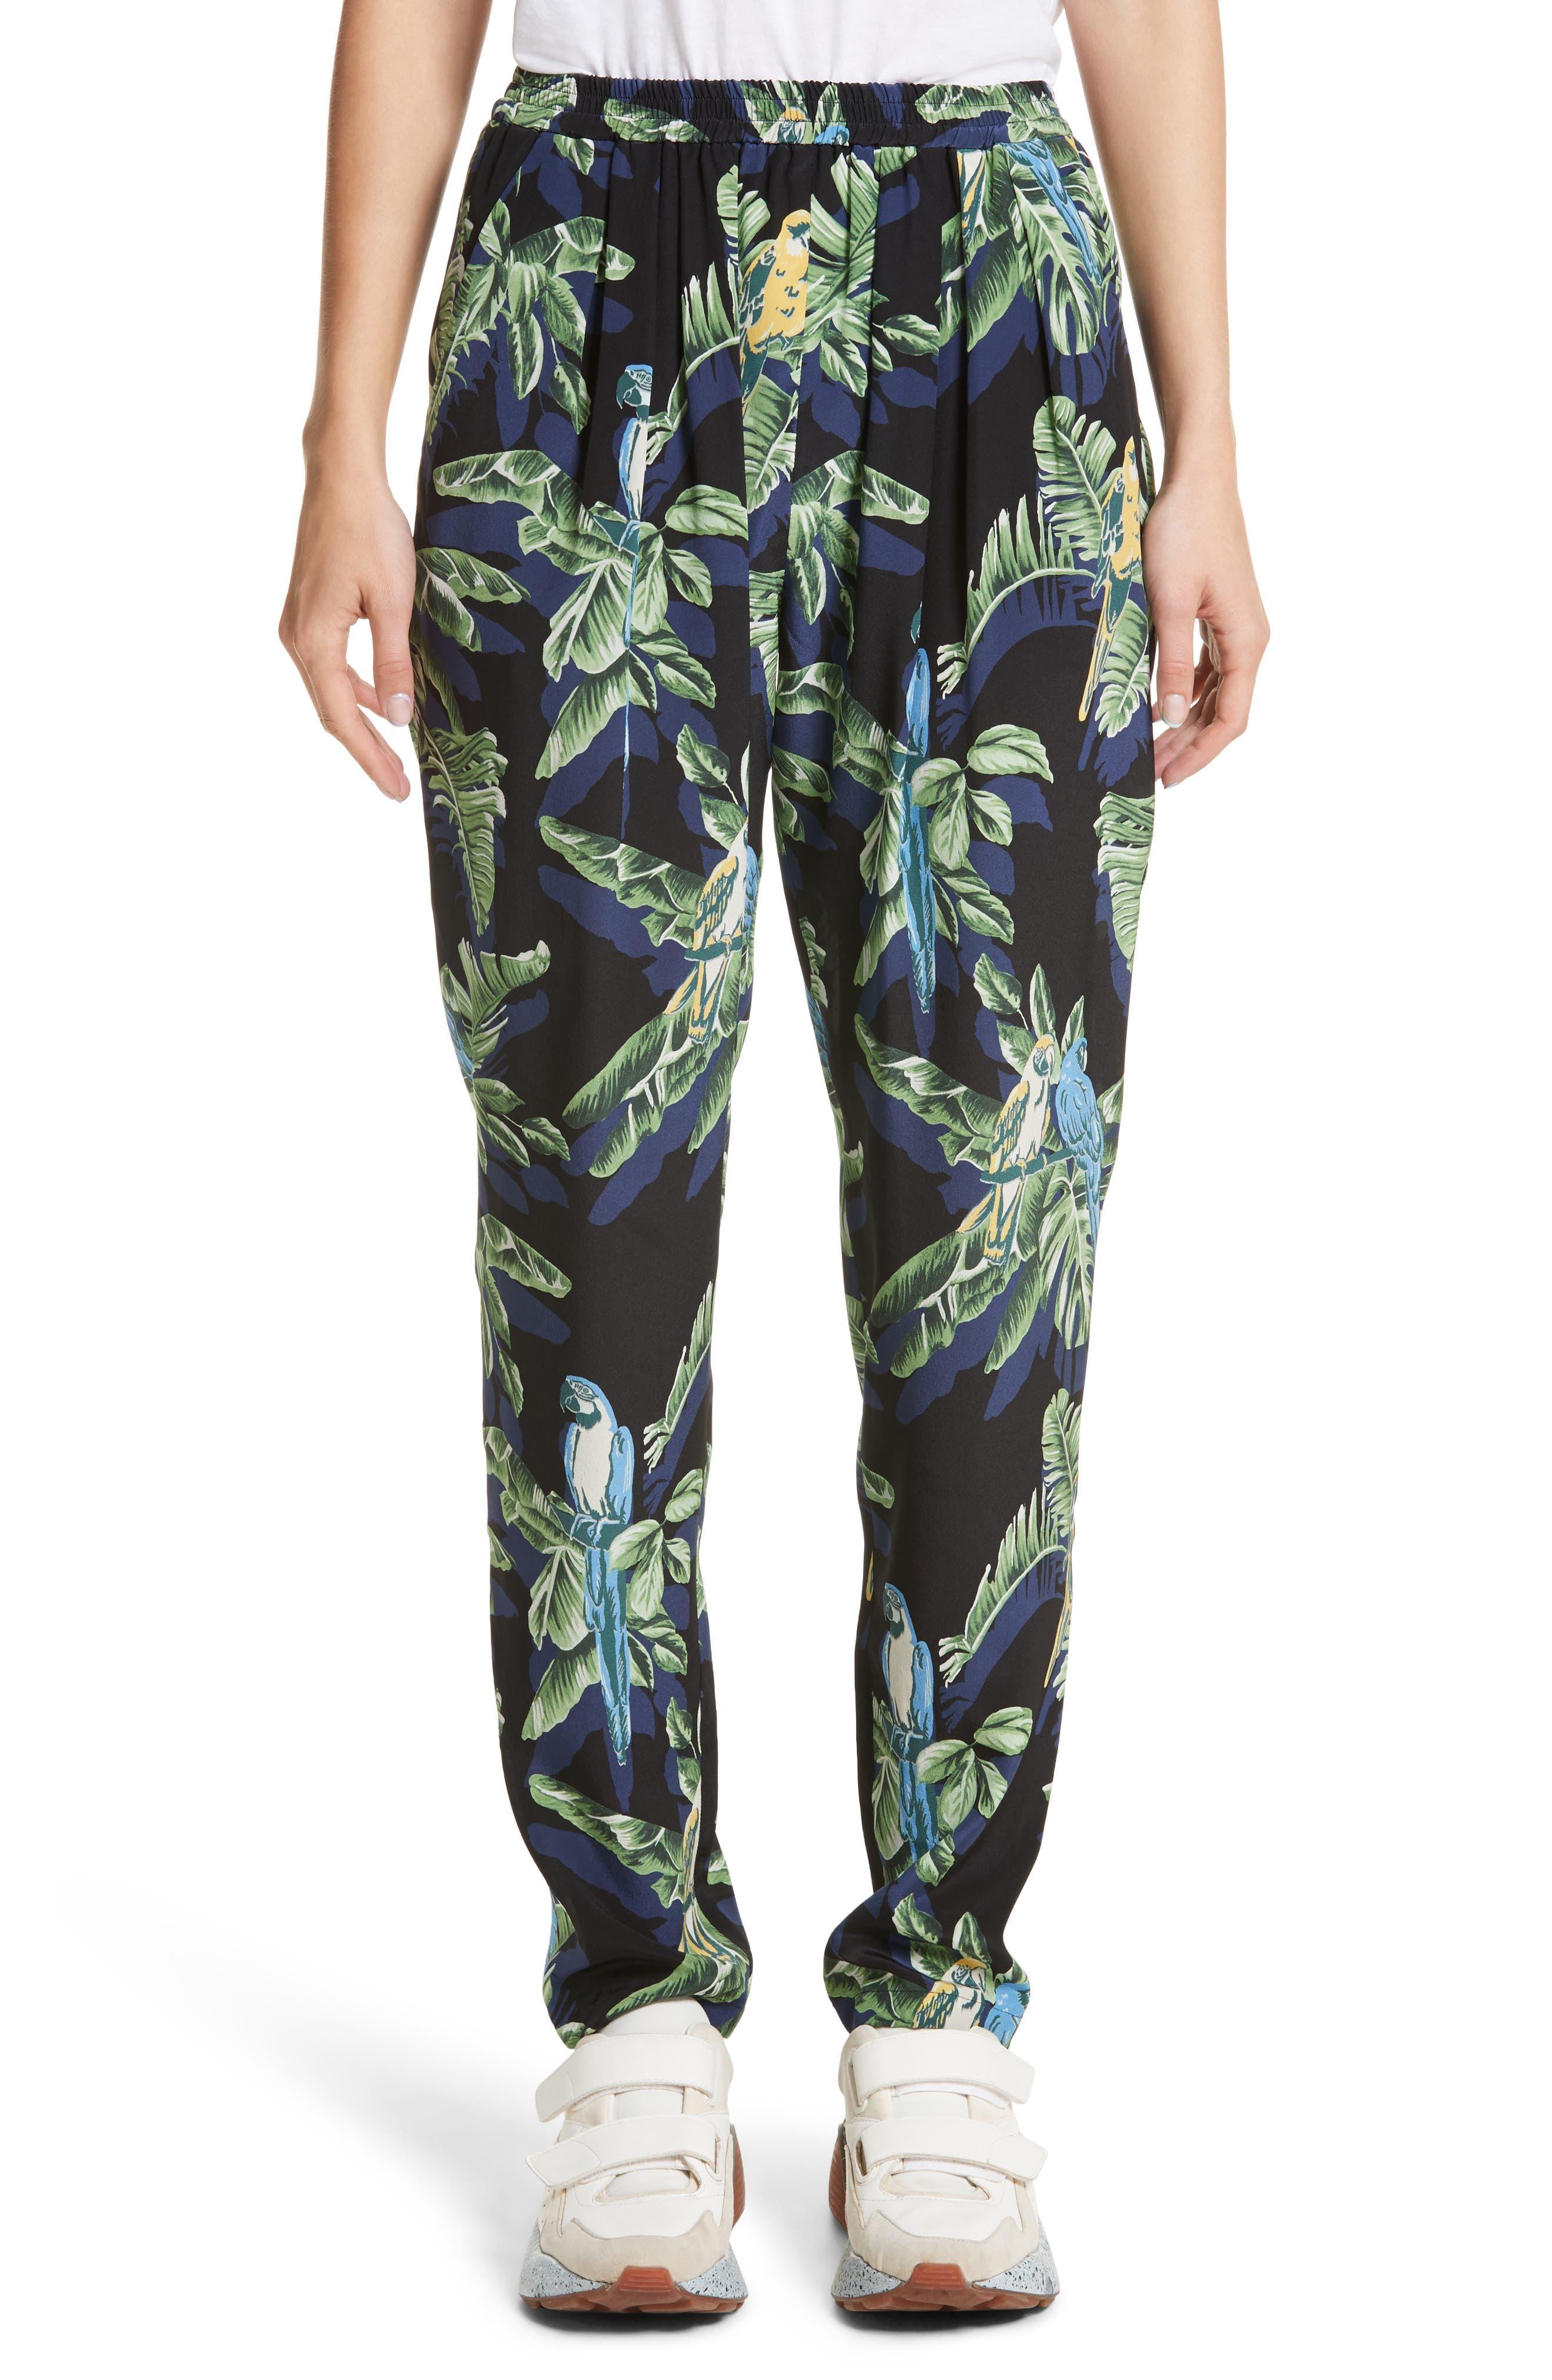 Birds of Paradise Silk Crêpe de Chine Pants,                             Main thumbnail 1, color,                             001